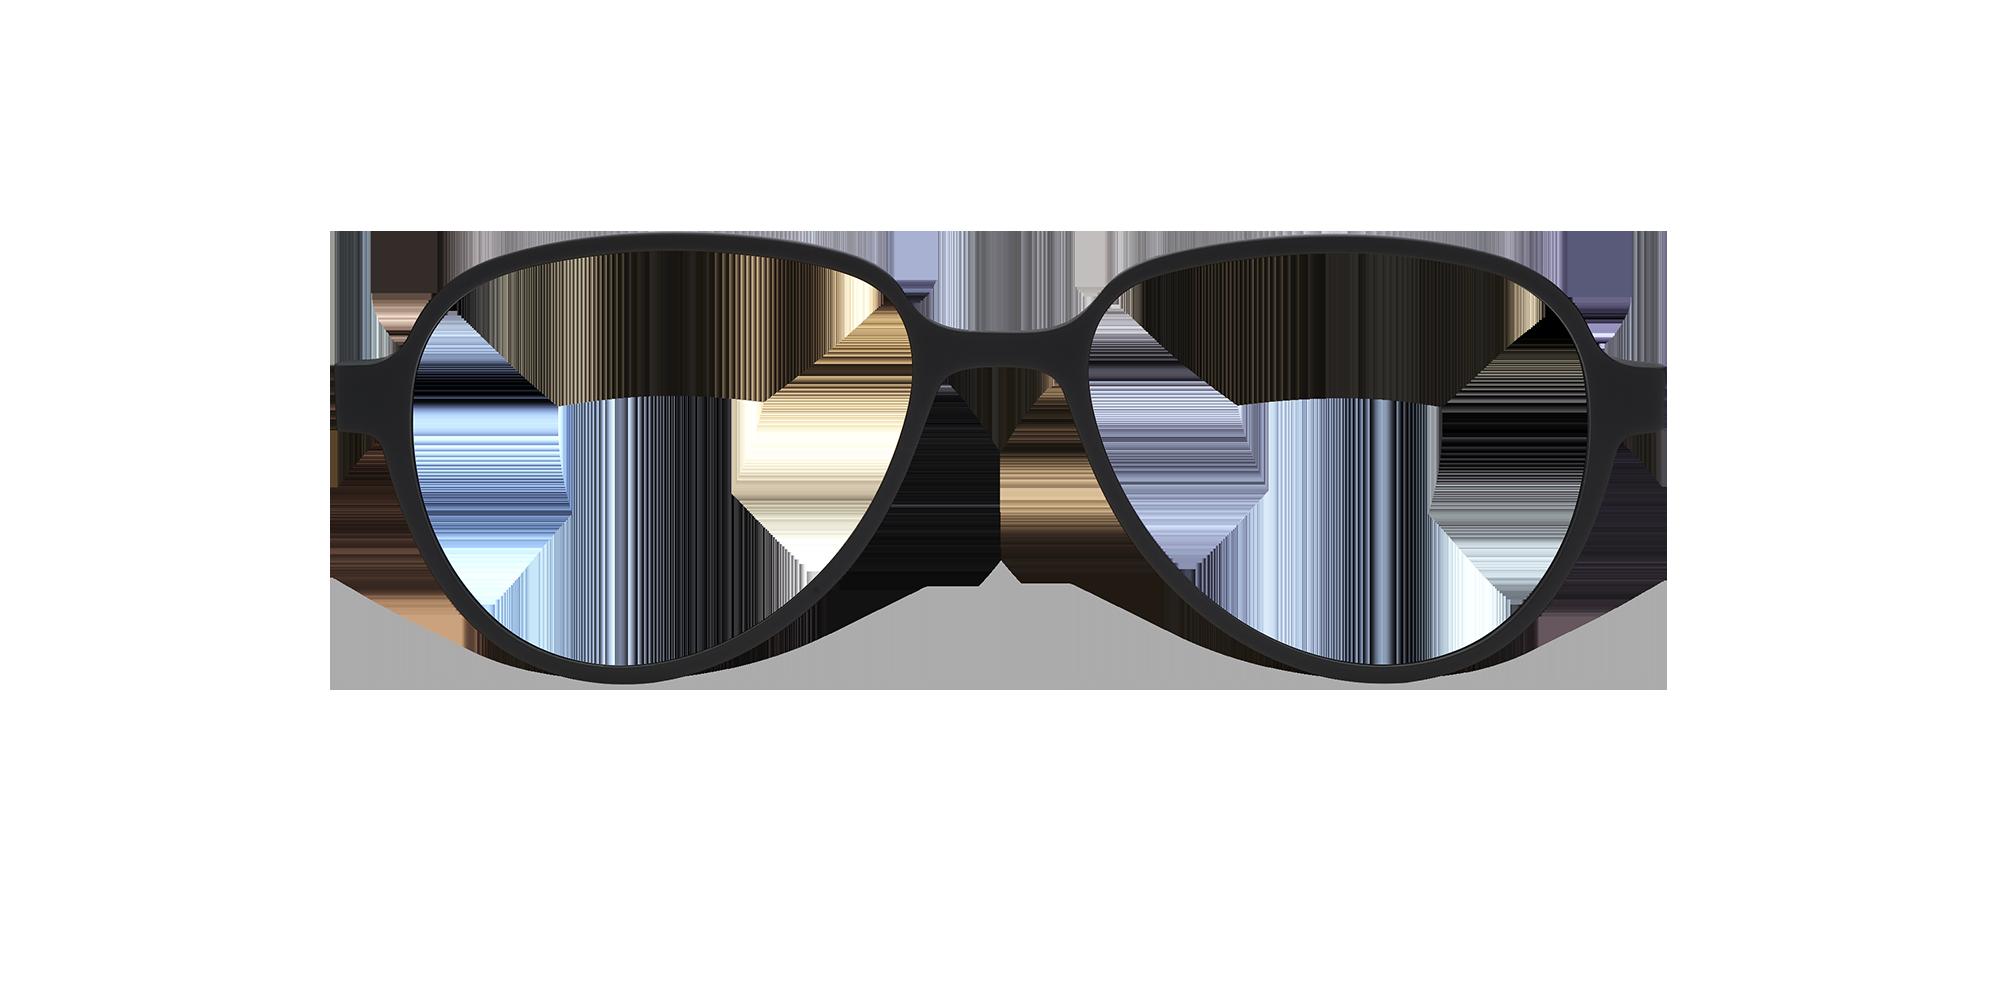 afflelou/france/products/smart_clip/clips_glasses/TMK43BBBK015417.png